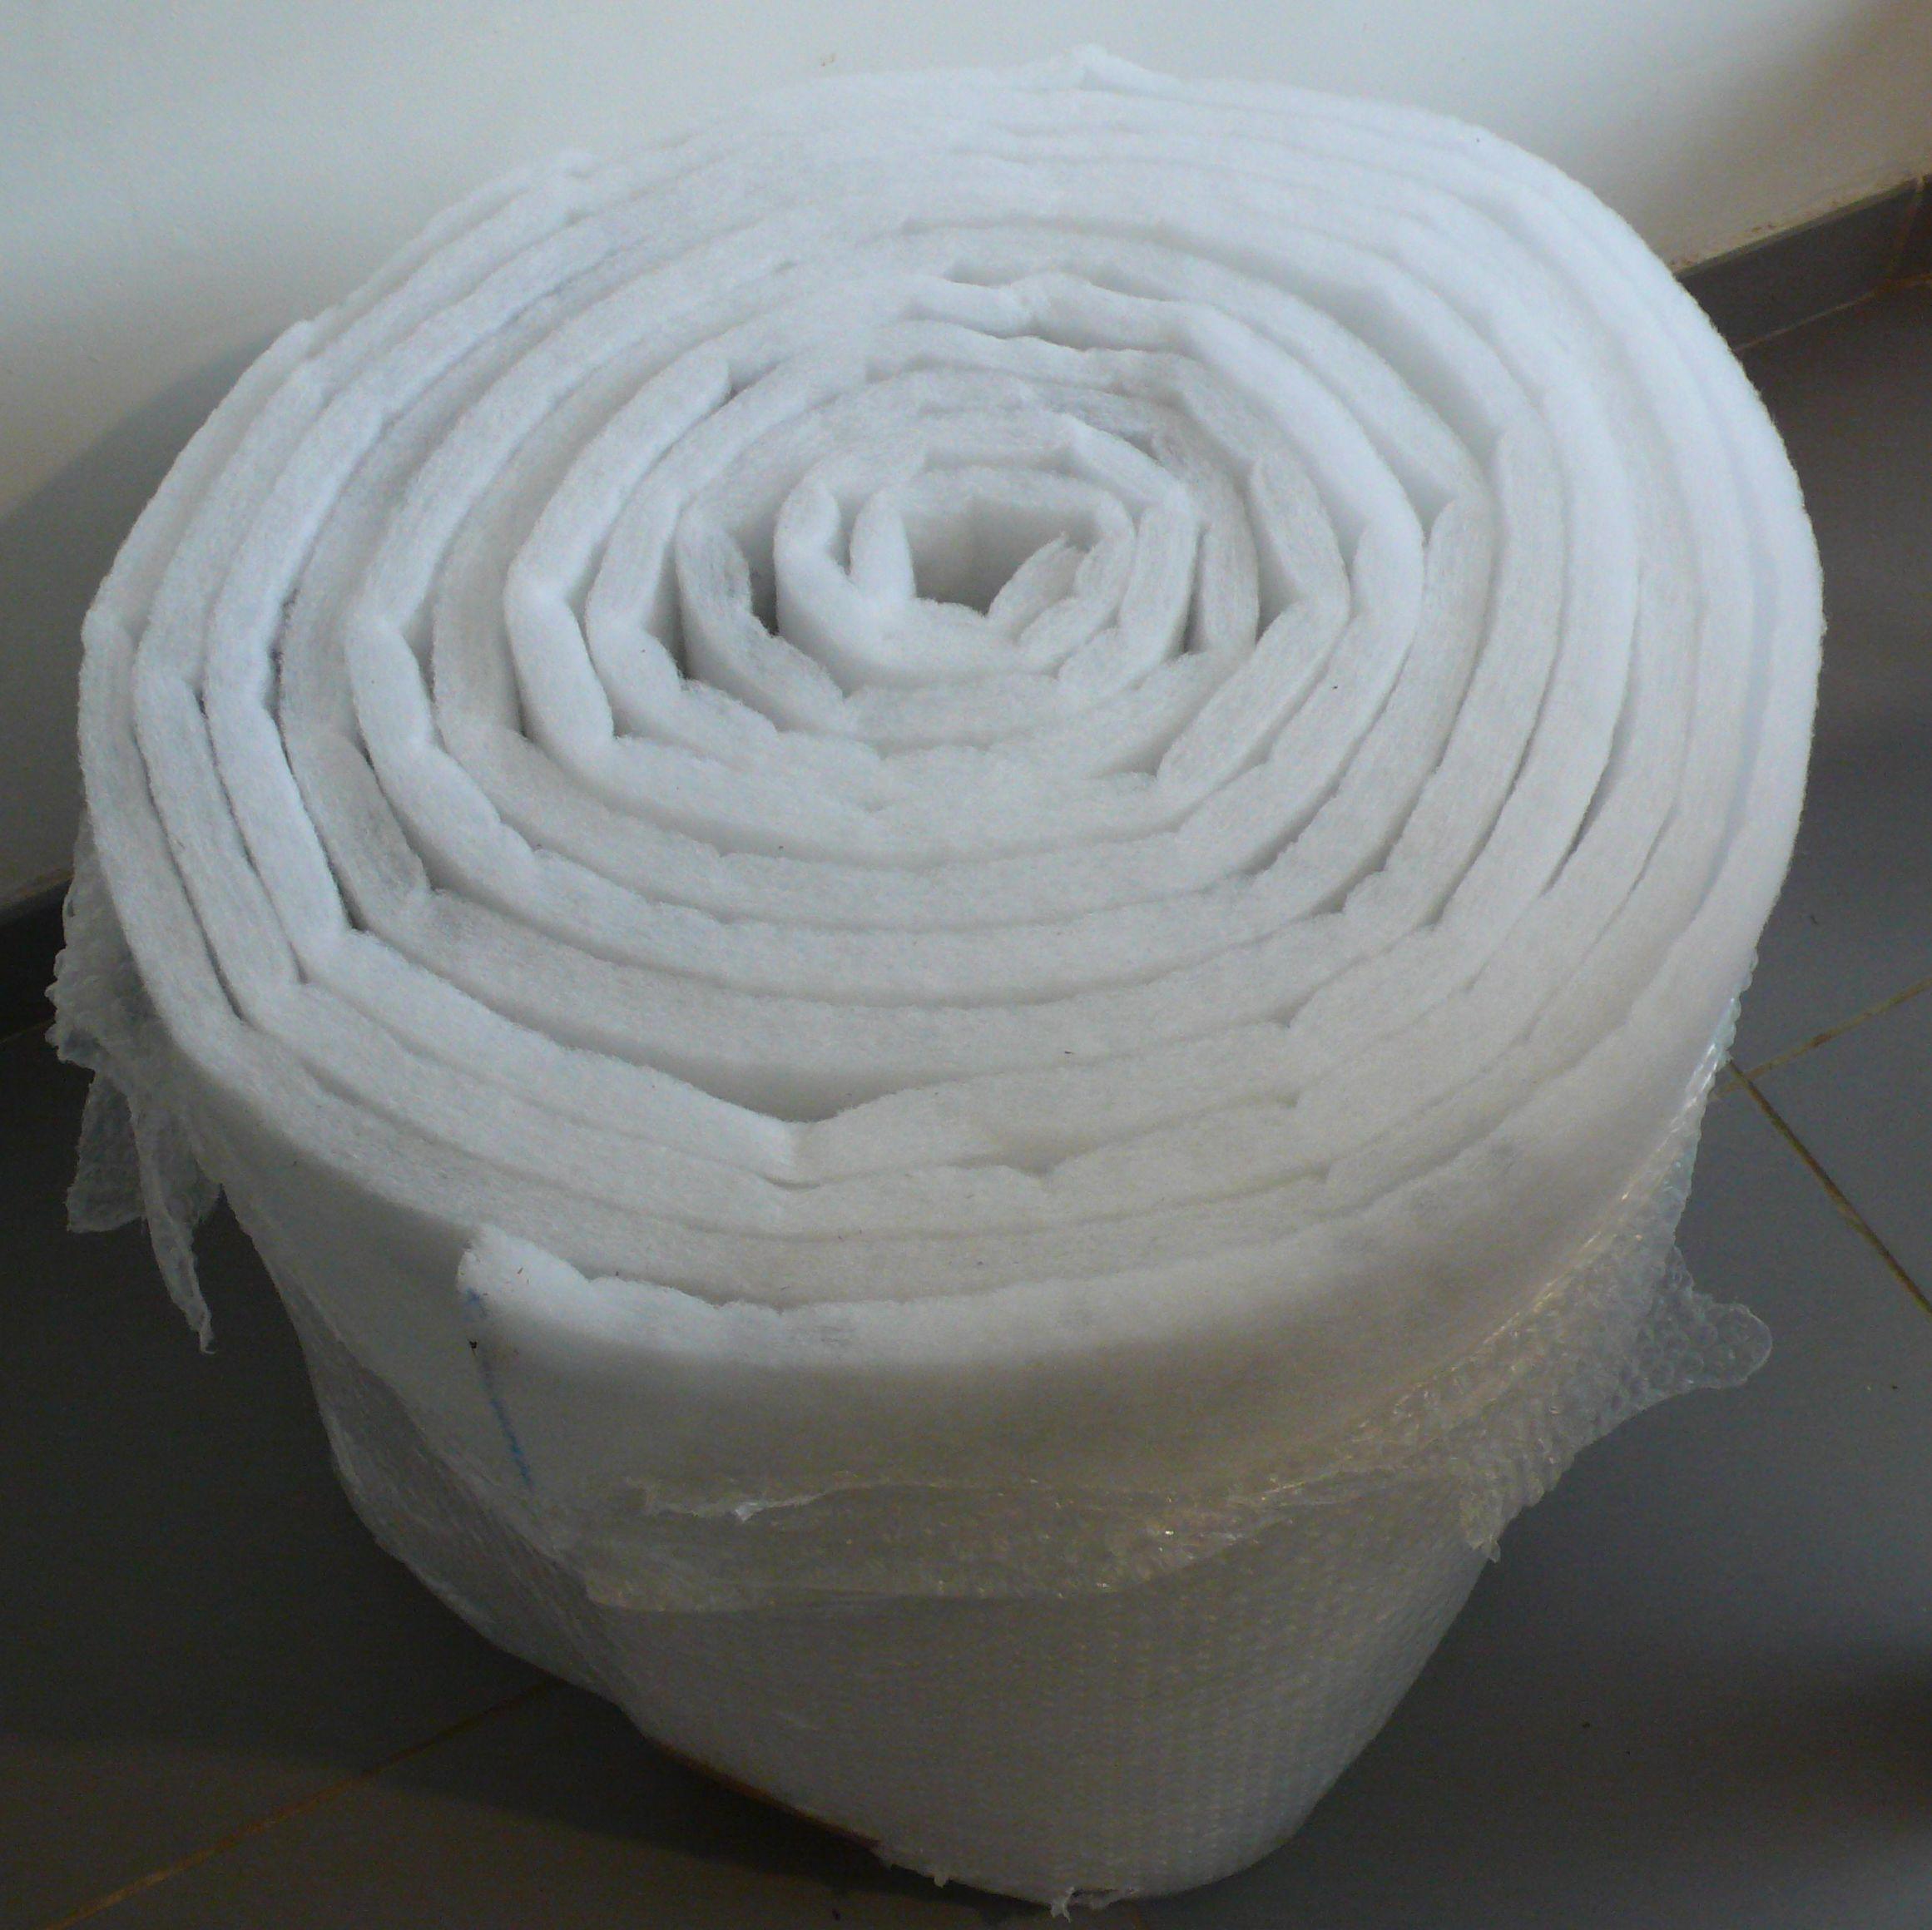 les diff rents types de filtres air grossier fin absolu. Black Bedroom Furniture Sets. Home Design Ideas